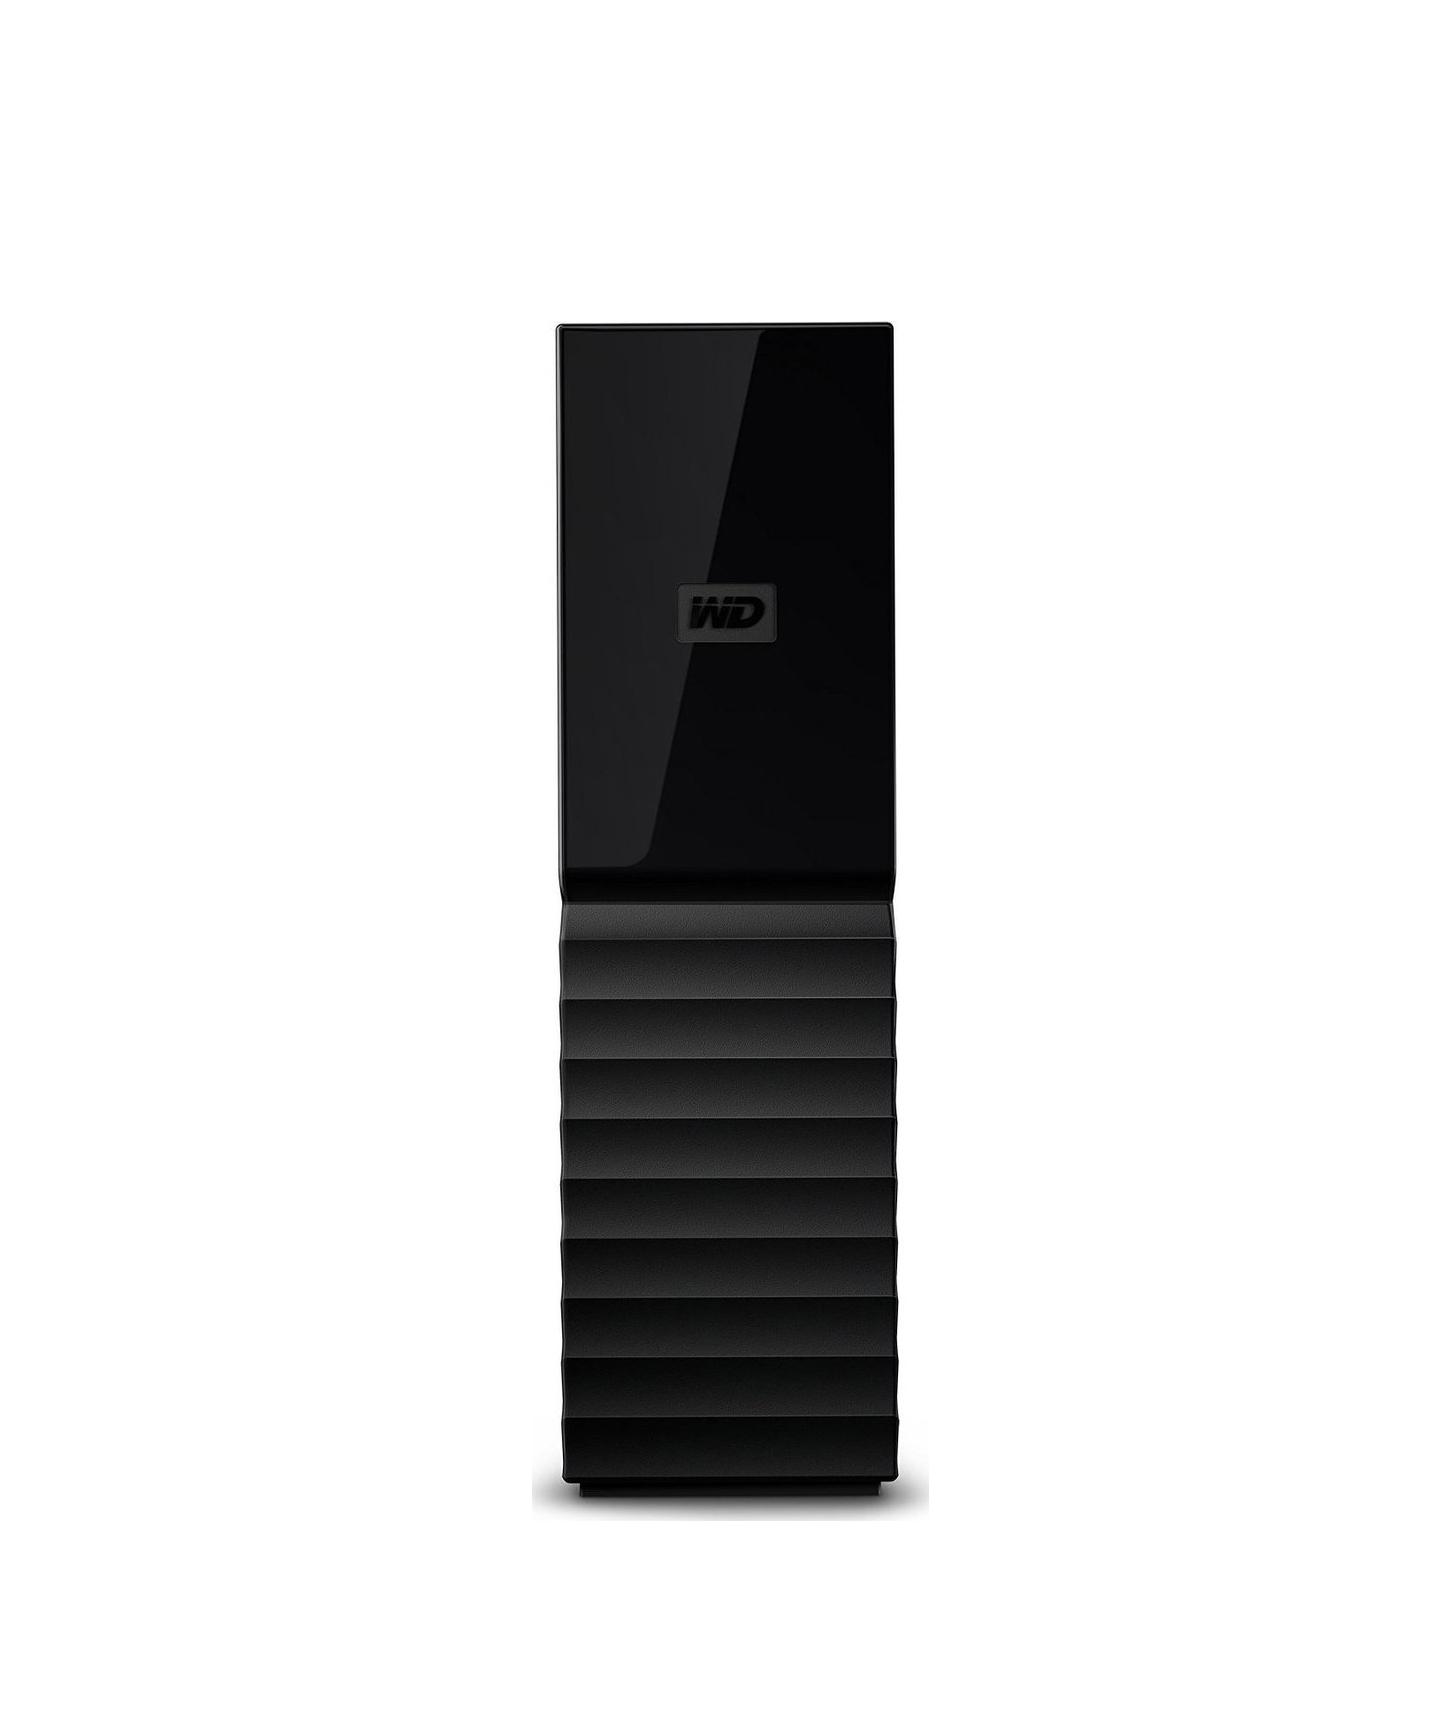 "Western Digital My Book 6TB Εξωτερικός Σκληρός 3.5"" Δίσκος USB 3.0 Black"